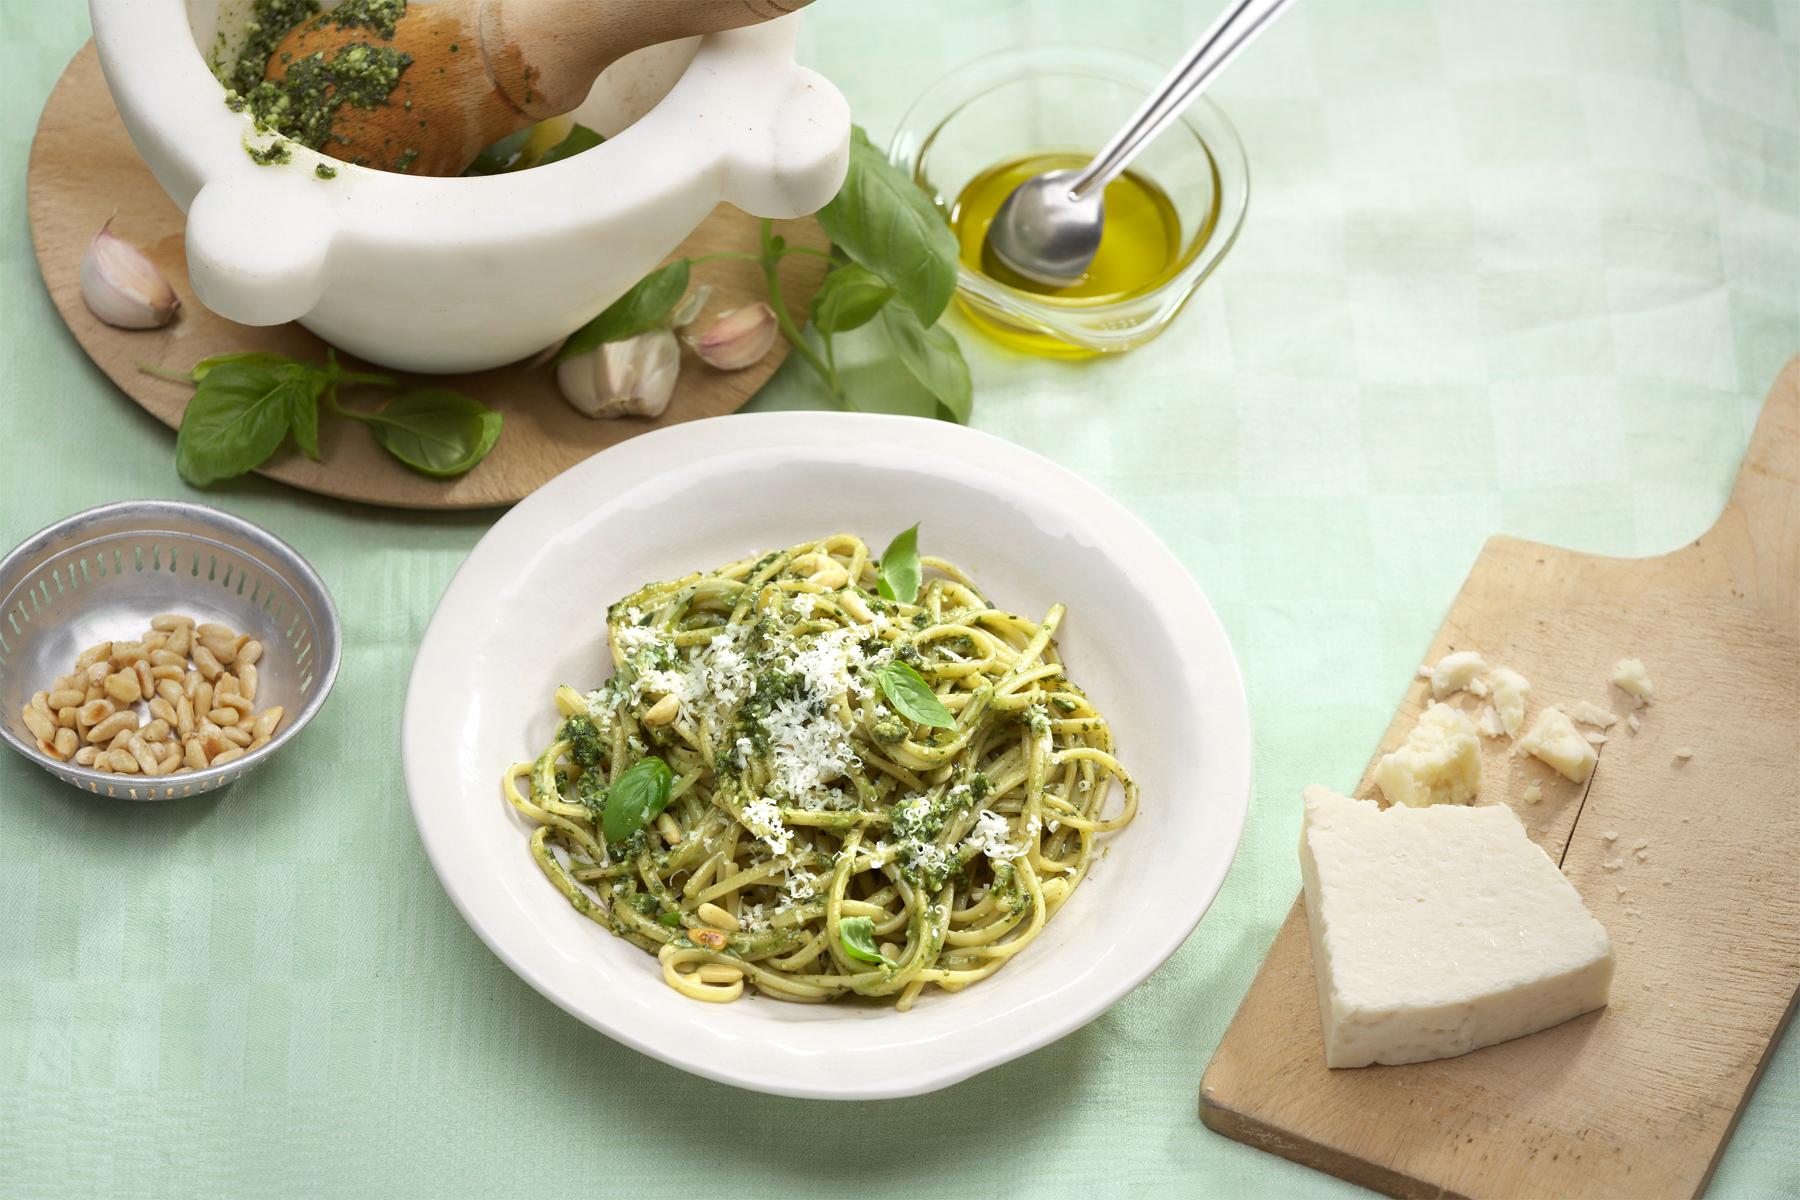 Leckere Rezeptidee - Spaghetti mit Pesto Verde